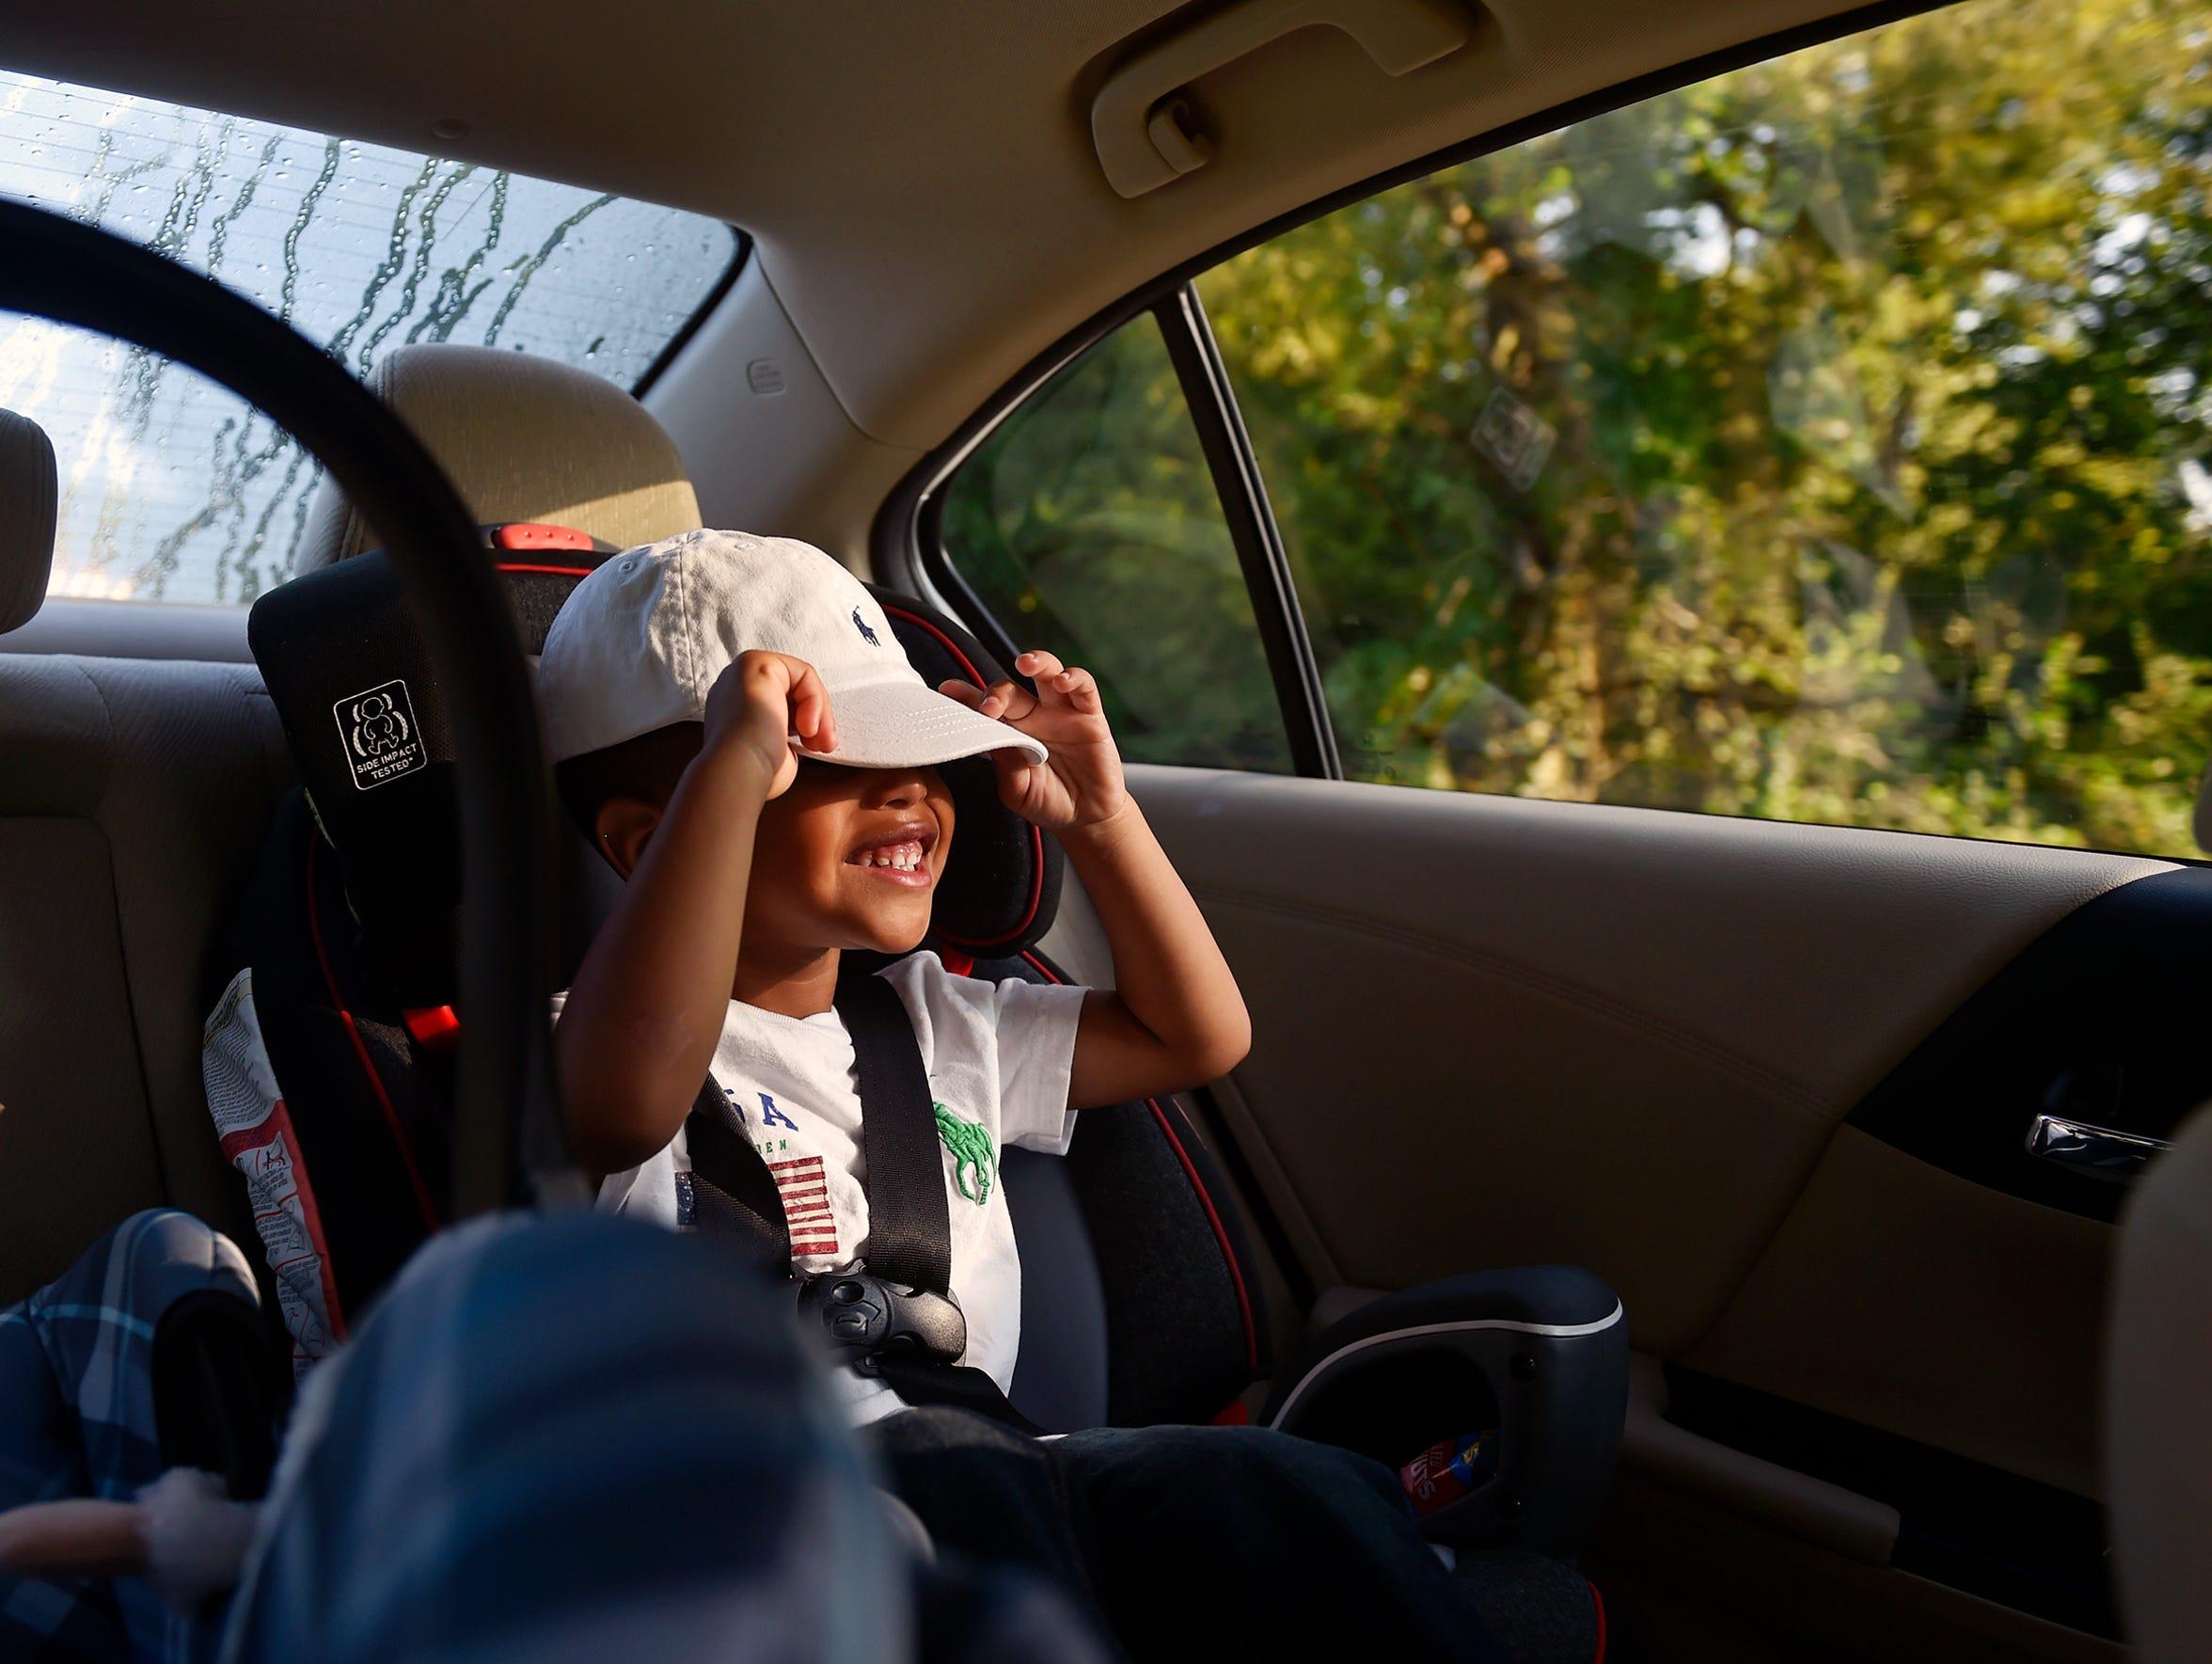 Kenyetta Redman's 3-year-old son pulls his cap visor